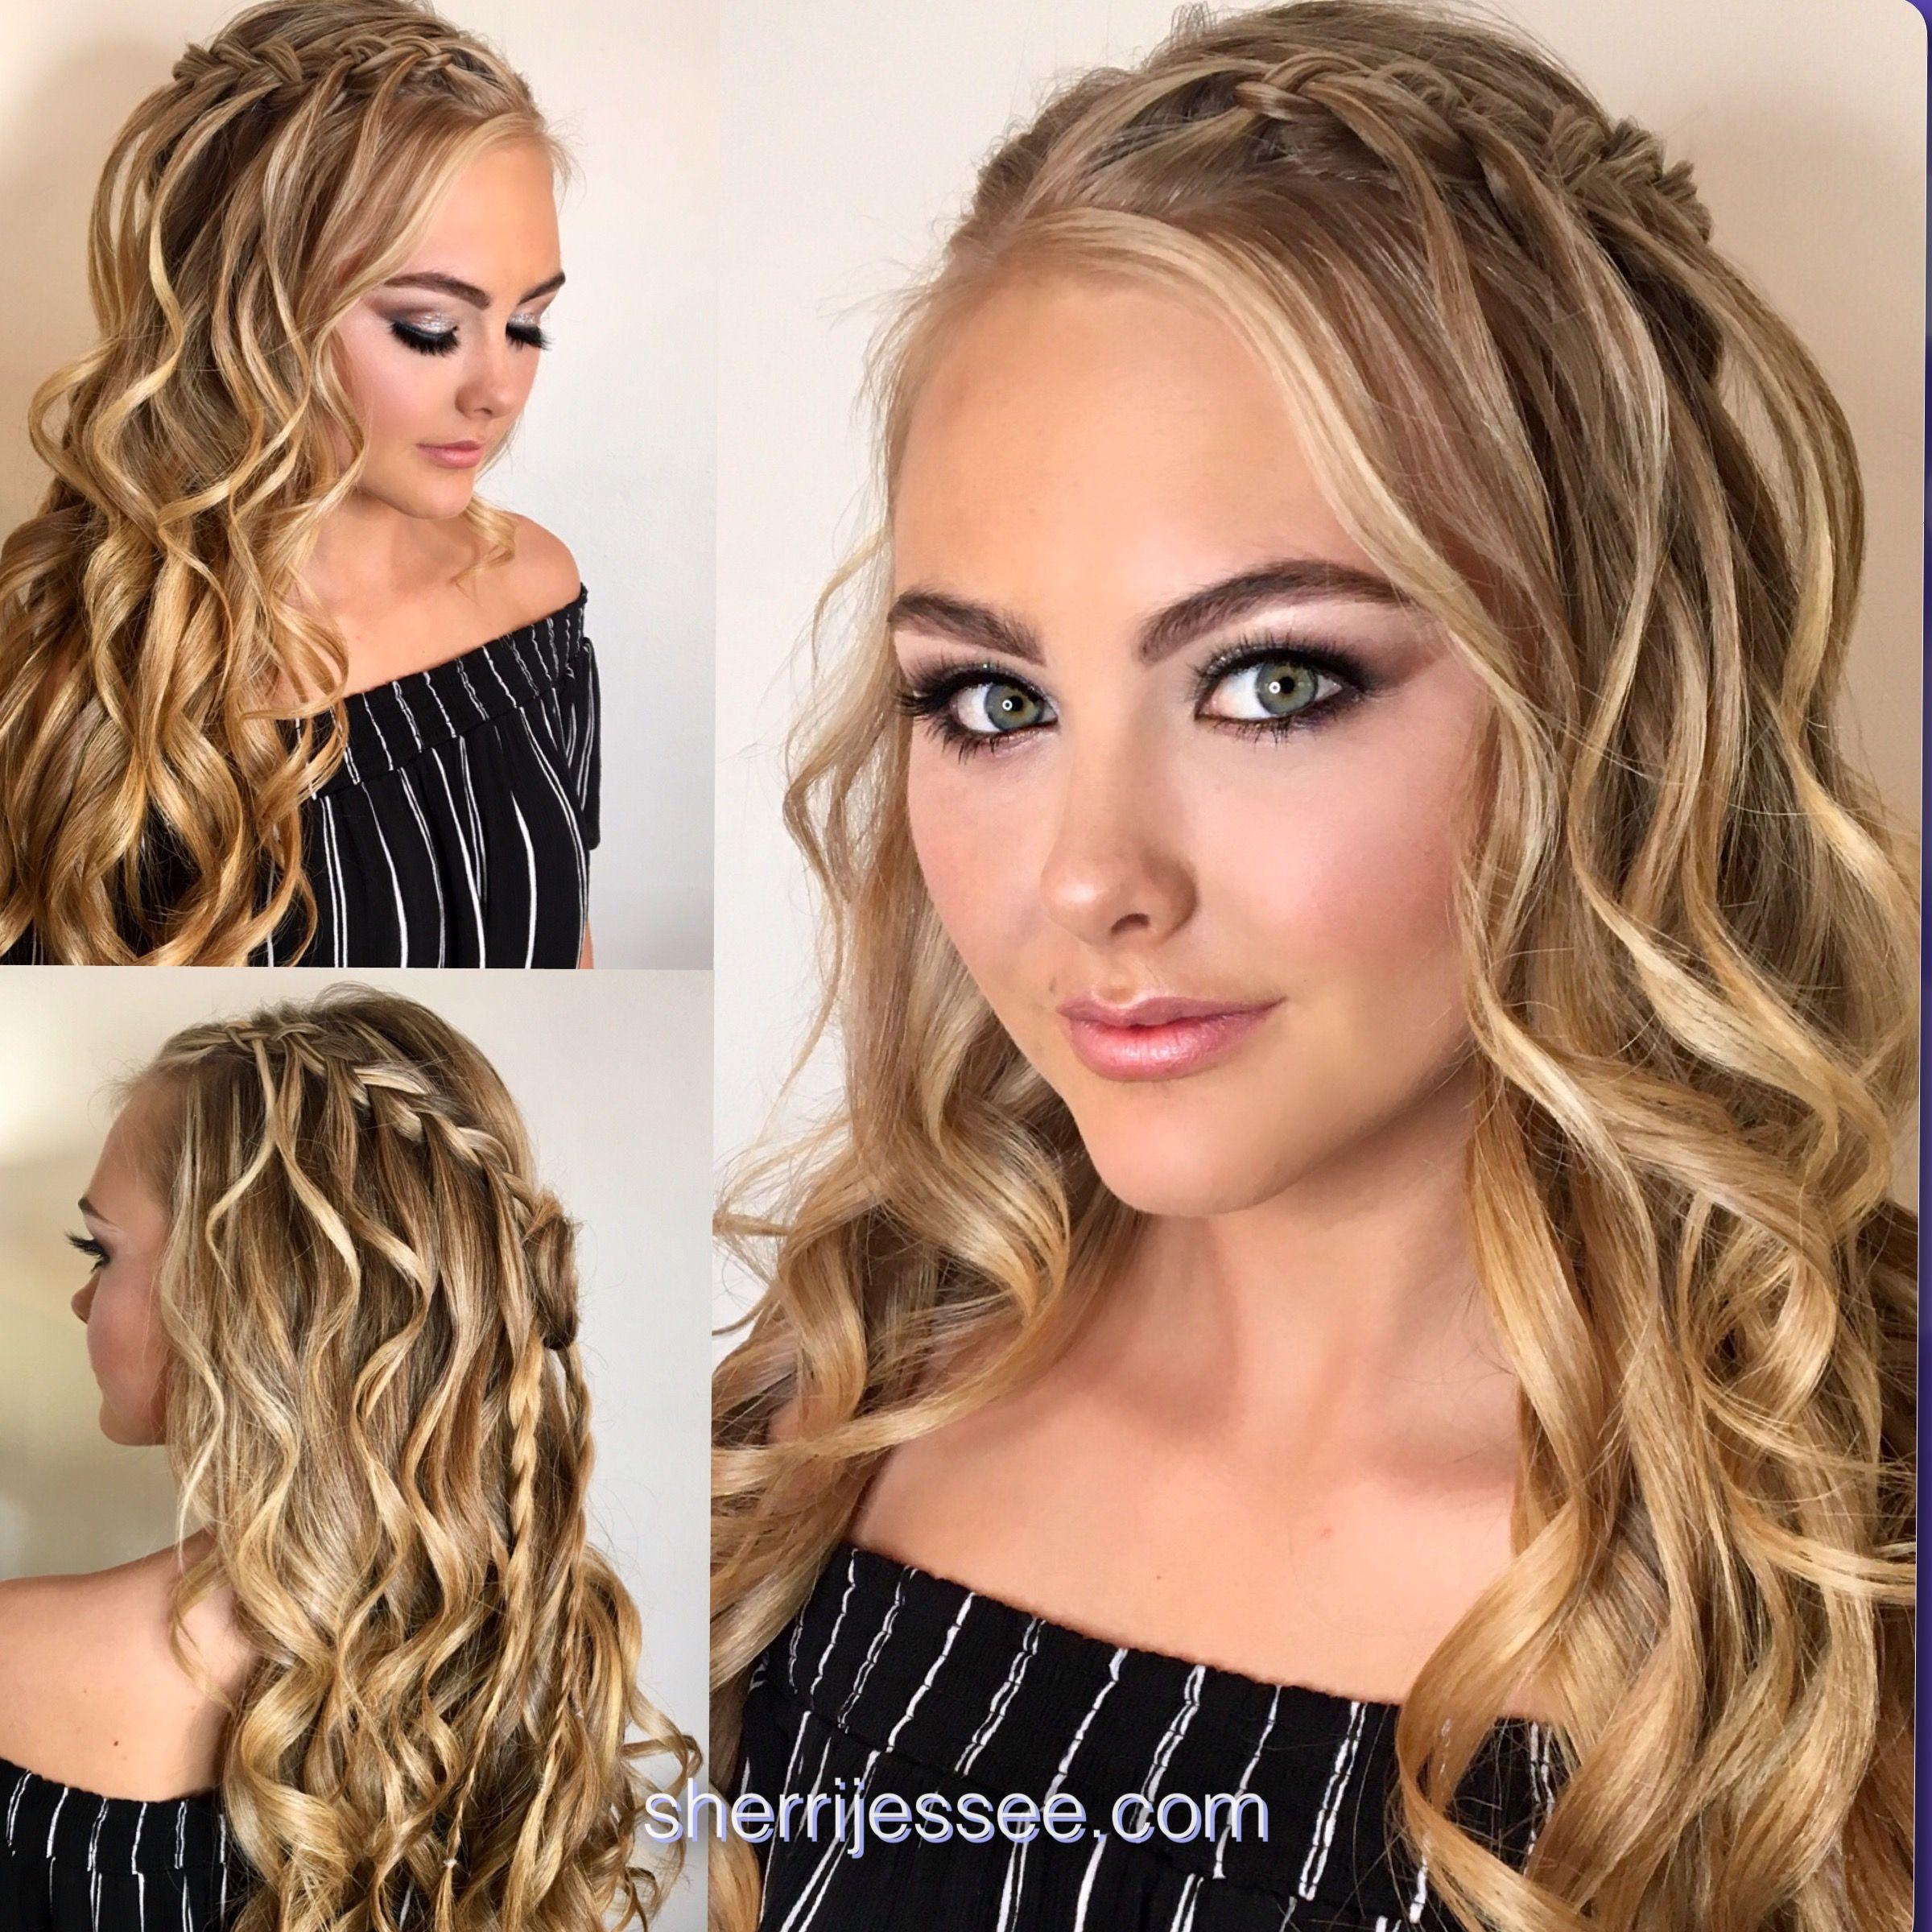 #prom #promhair #makeup #halfuphalfdown #curls #waterfallbraid #3strandbraid #blonde #sherrijessee #sherriready